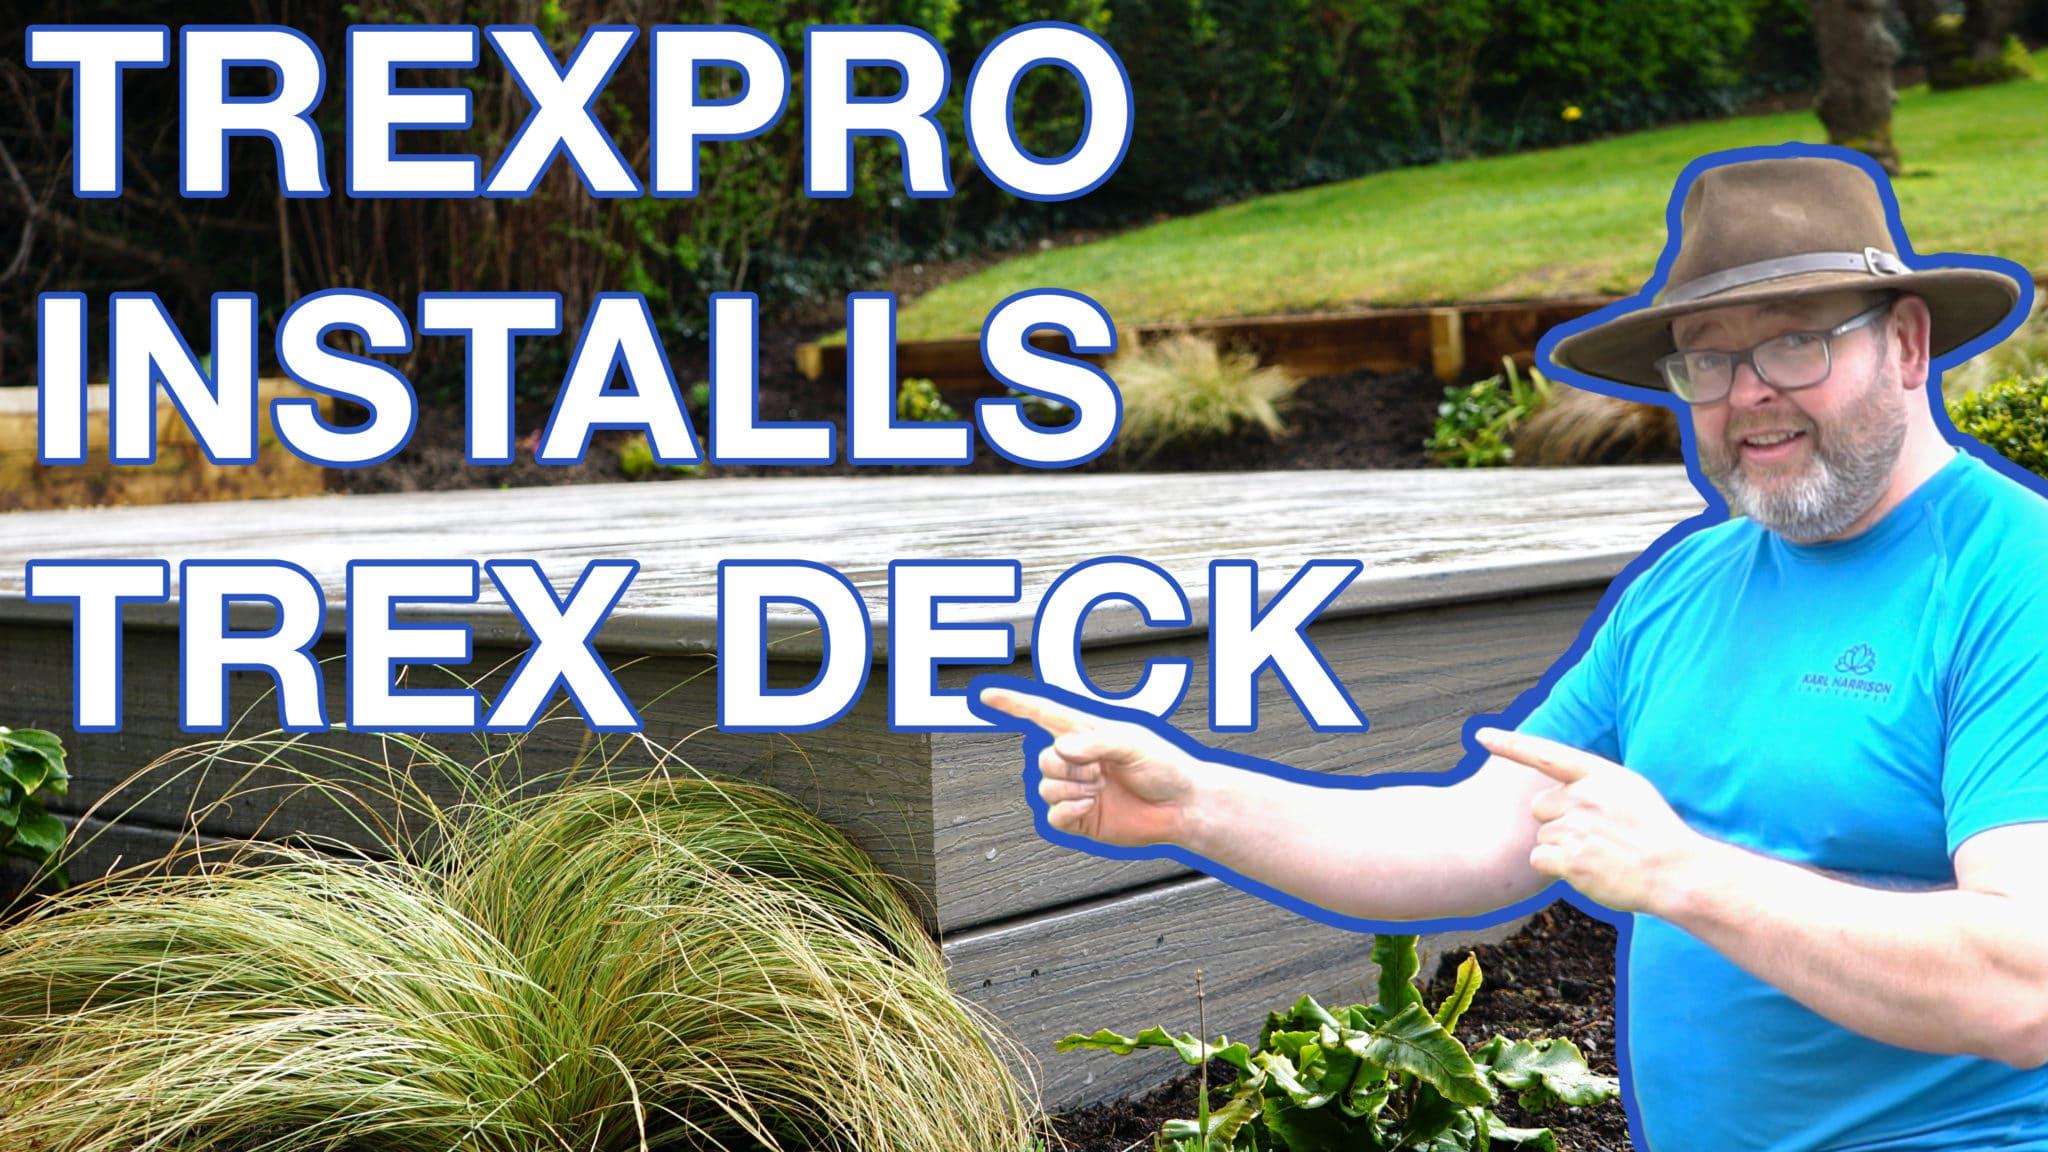 TrexPro Installs Trex Deck